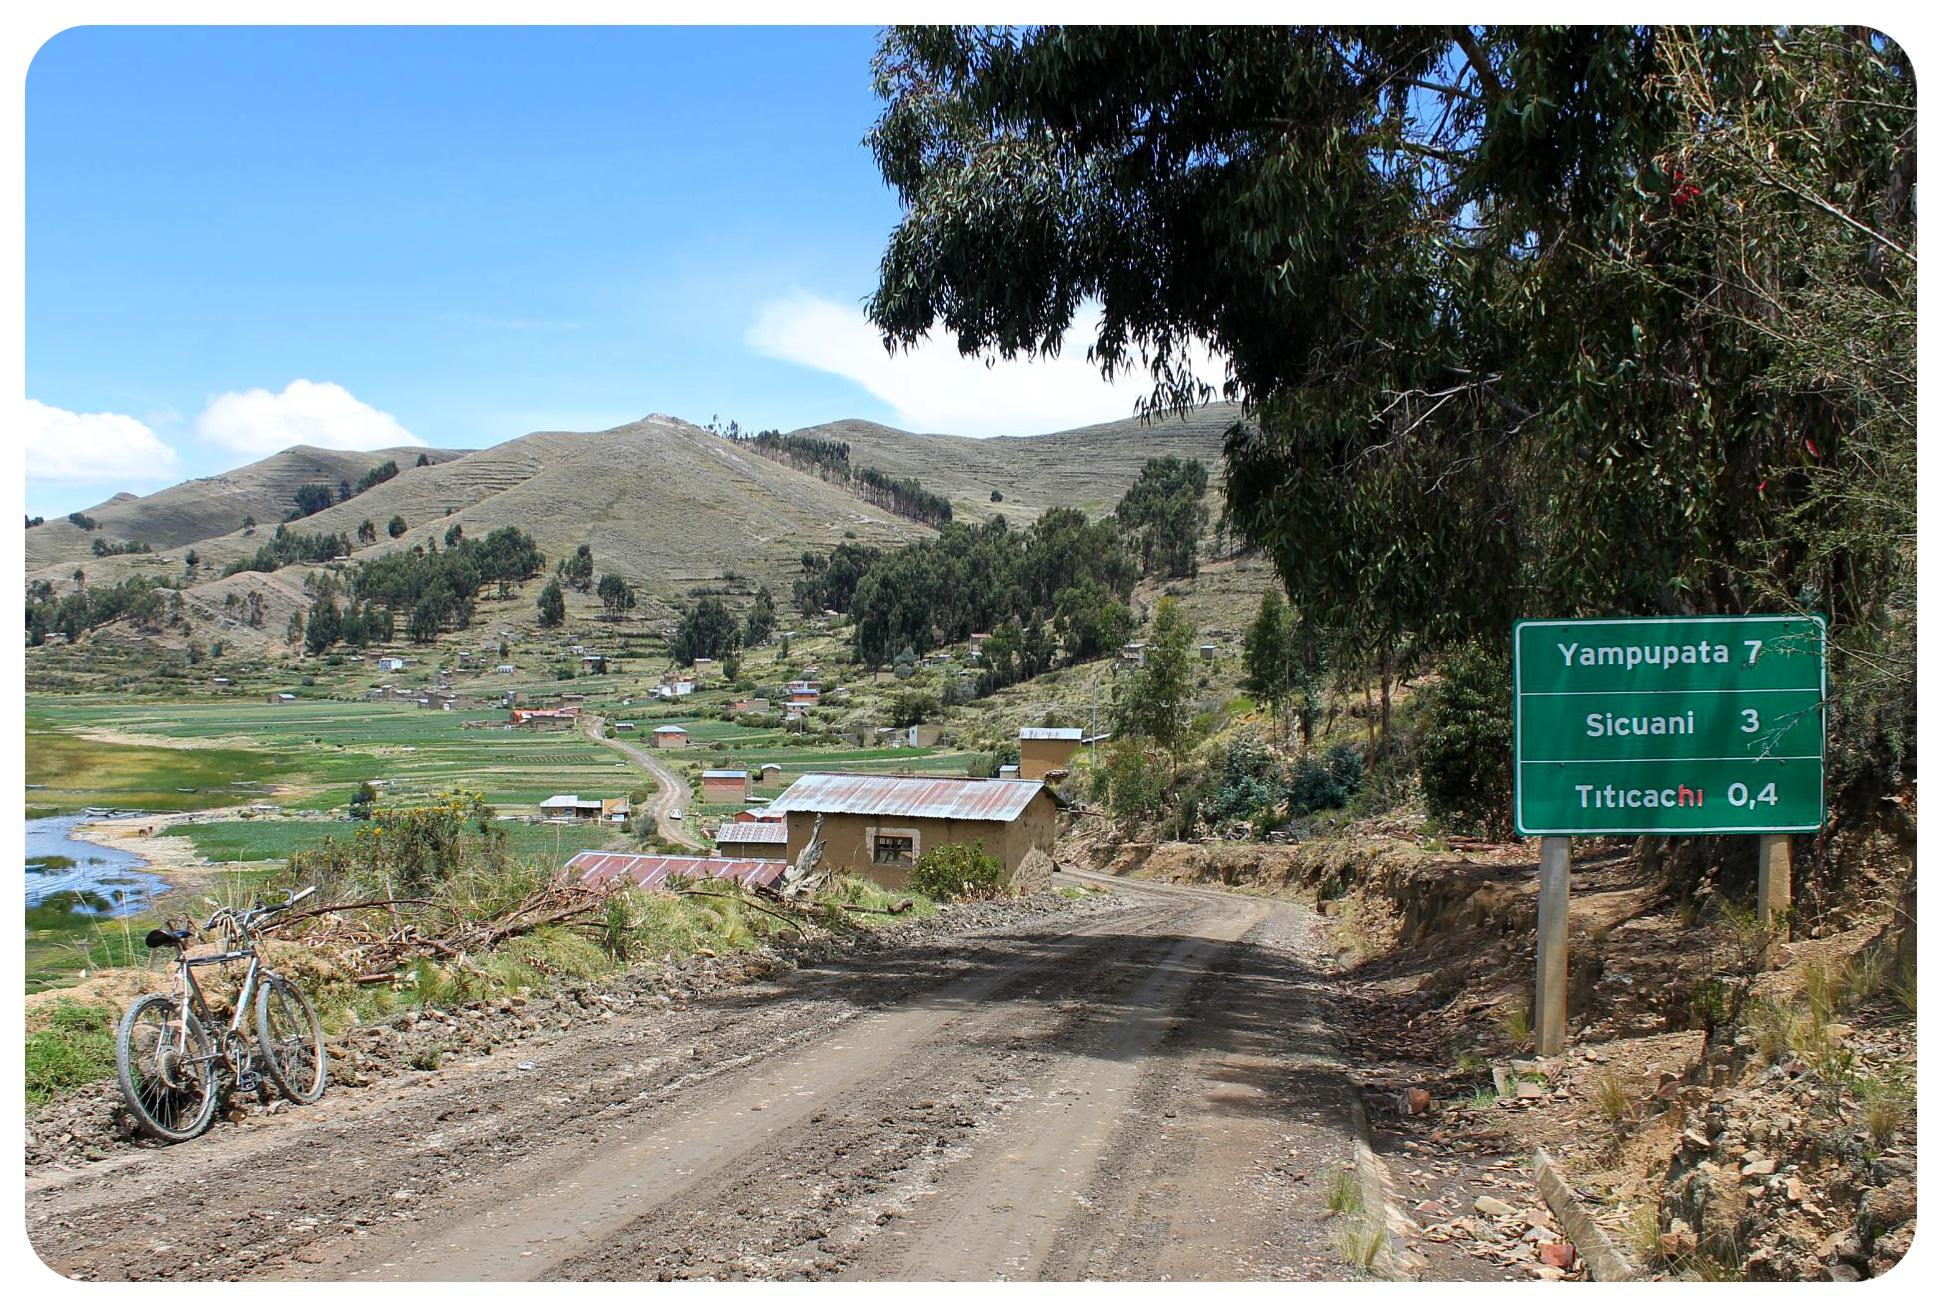 lake titicaca yampupata hike road